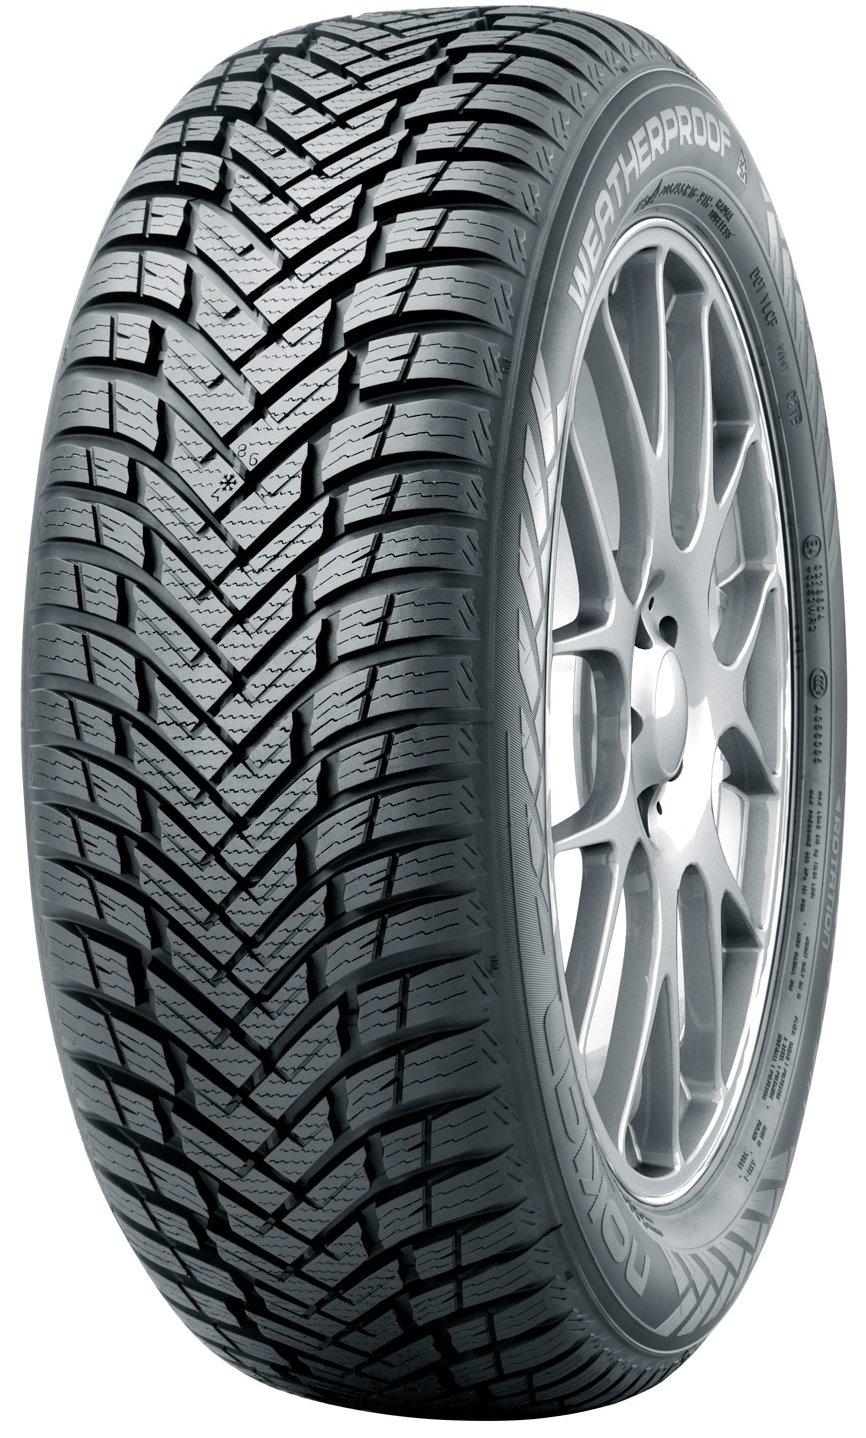 Neumático NOKIAN WEATHERPROOF 225/45R17 91 V